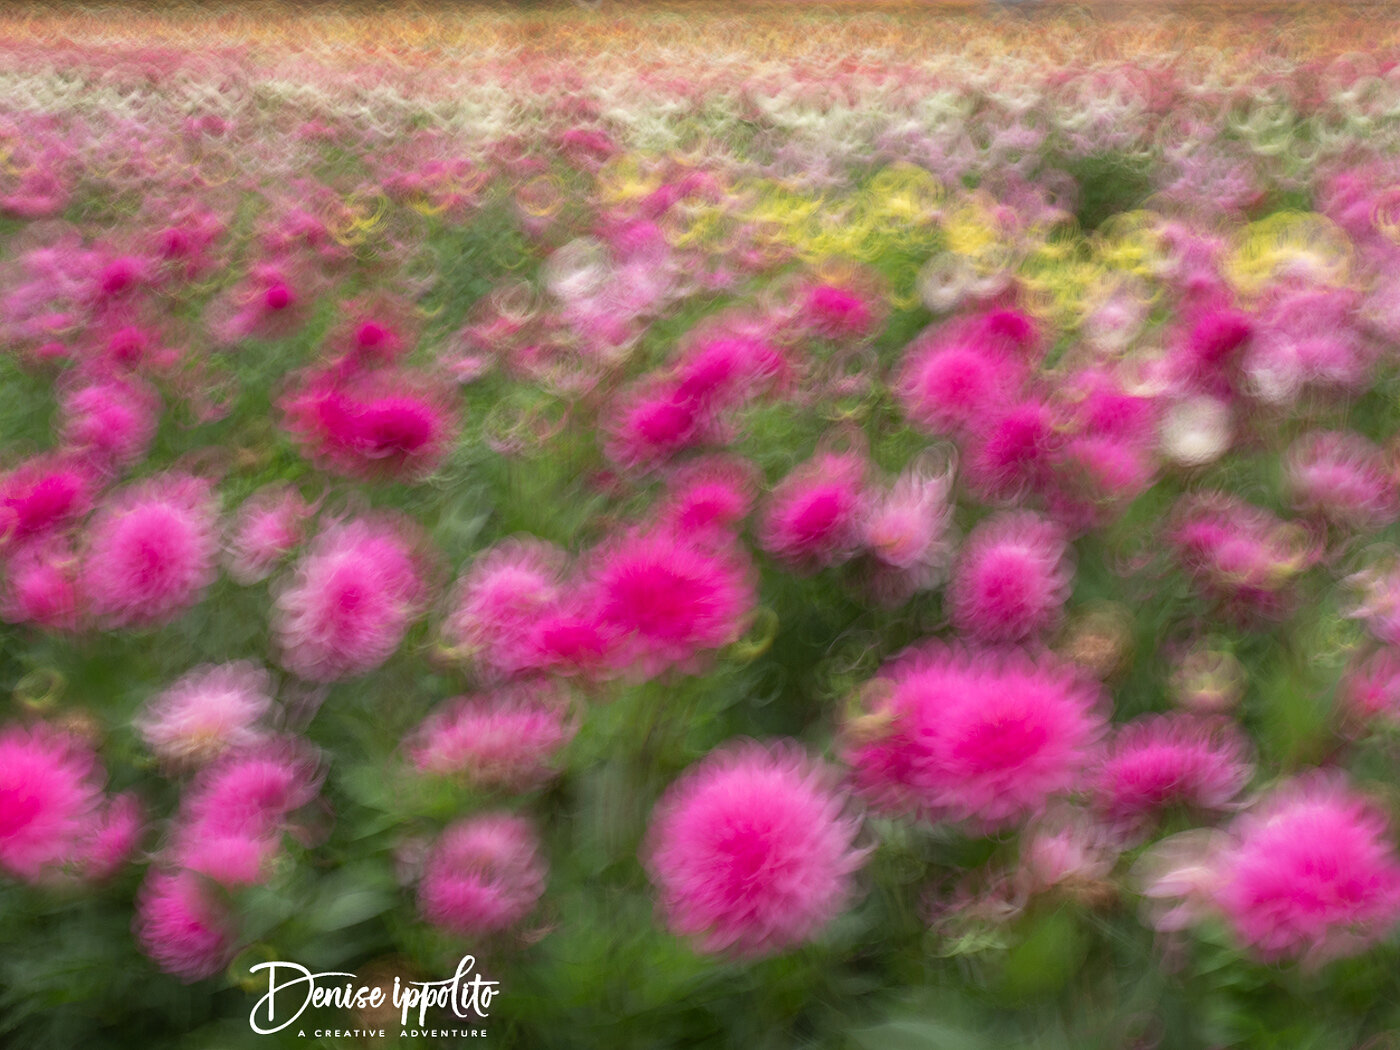 In-camera blur at 1/4 sec at f/22